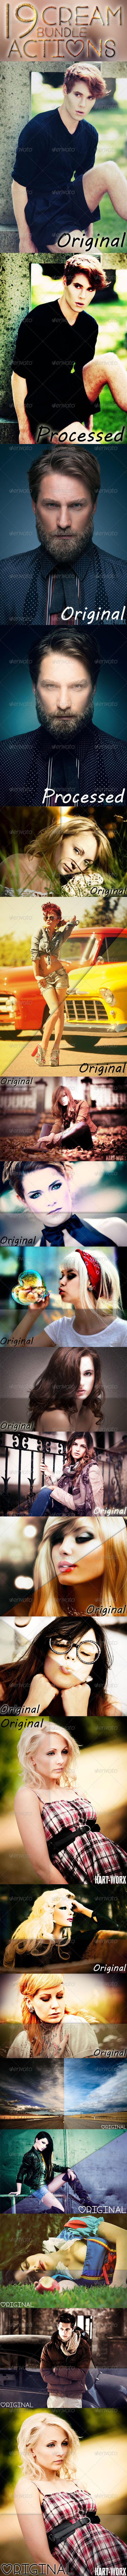 GraphicRiver 19 Cream Actions Bundle 8007126